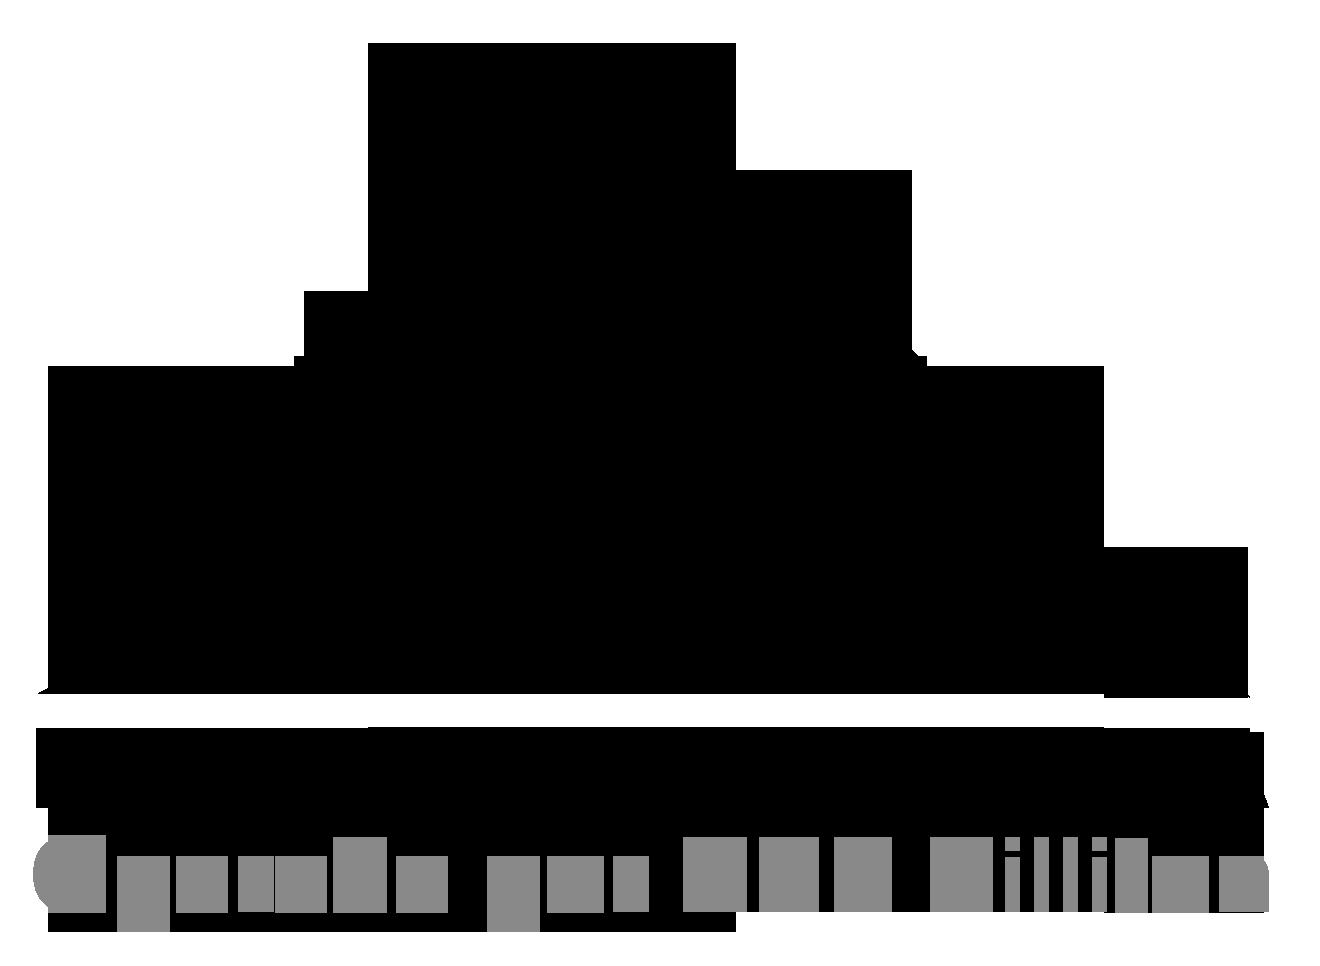 Minera escondida Logo